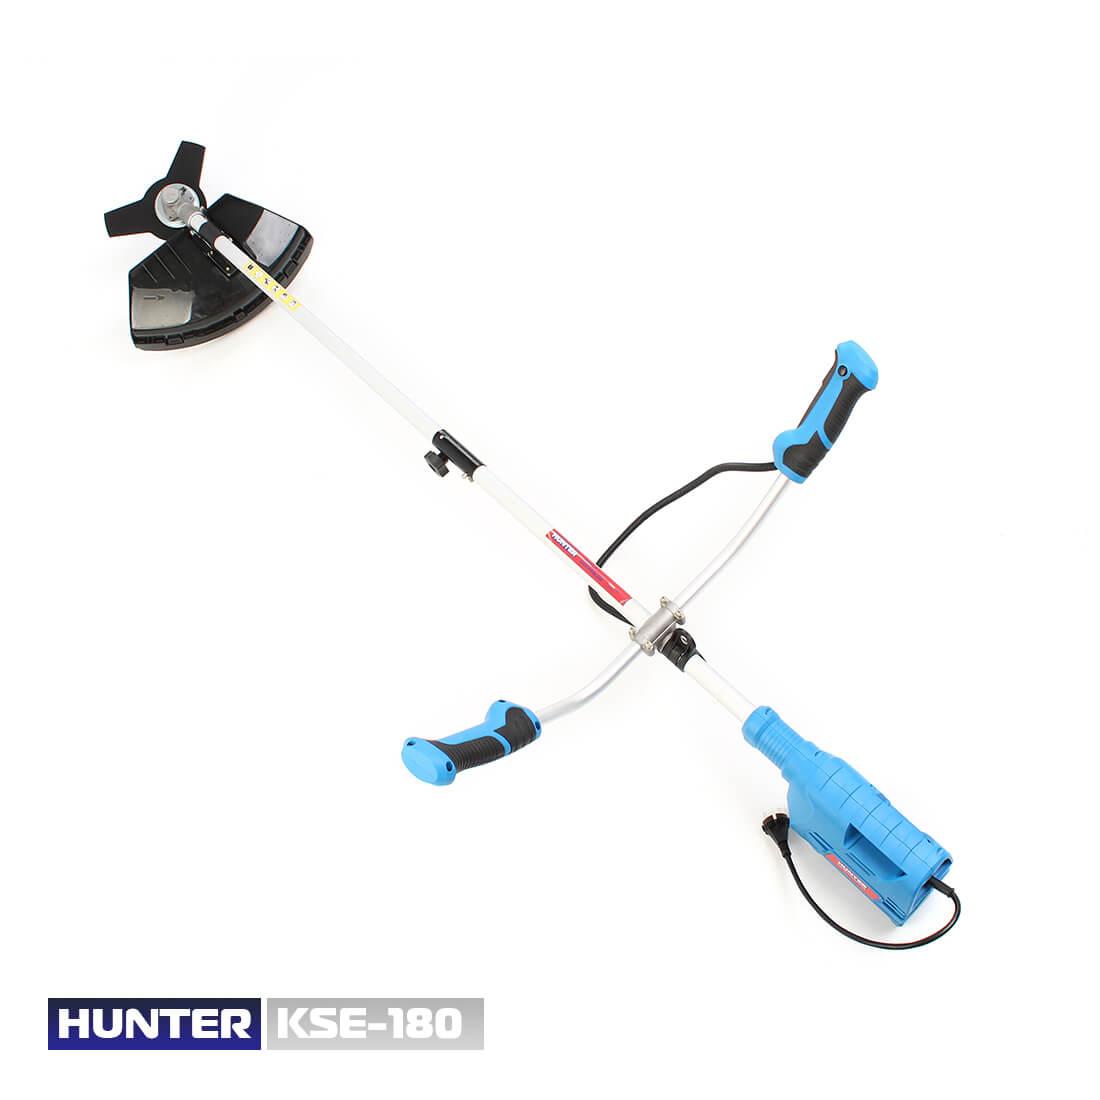 Фото Электрический триммер KSE-180 цена 2300грн №1 — Hunter